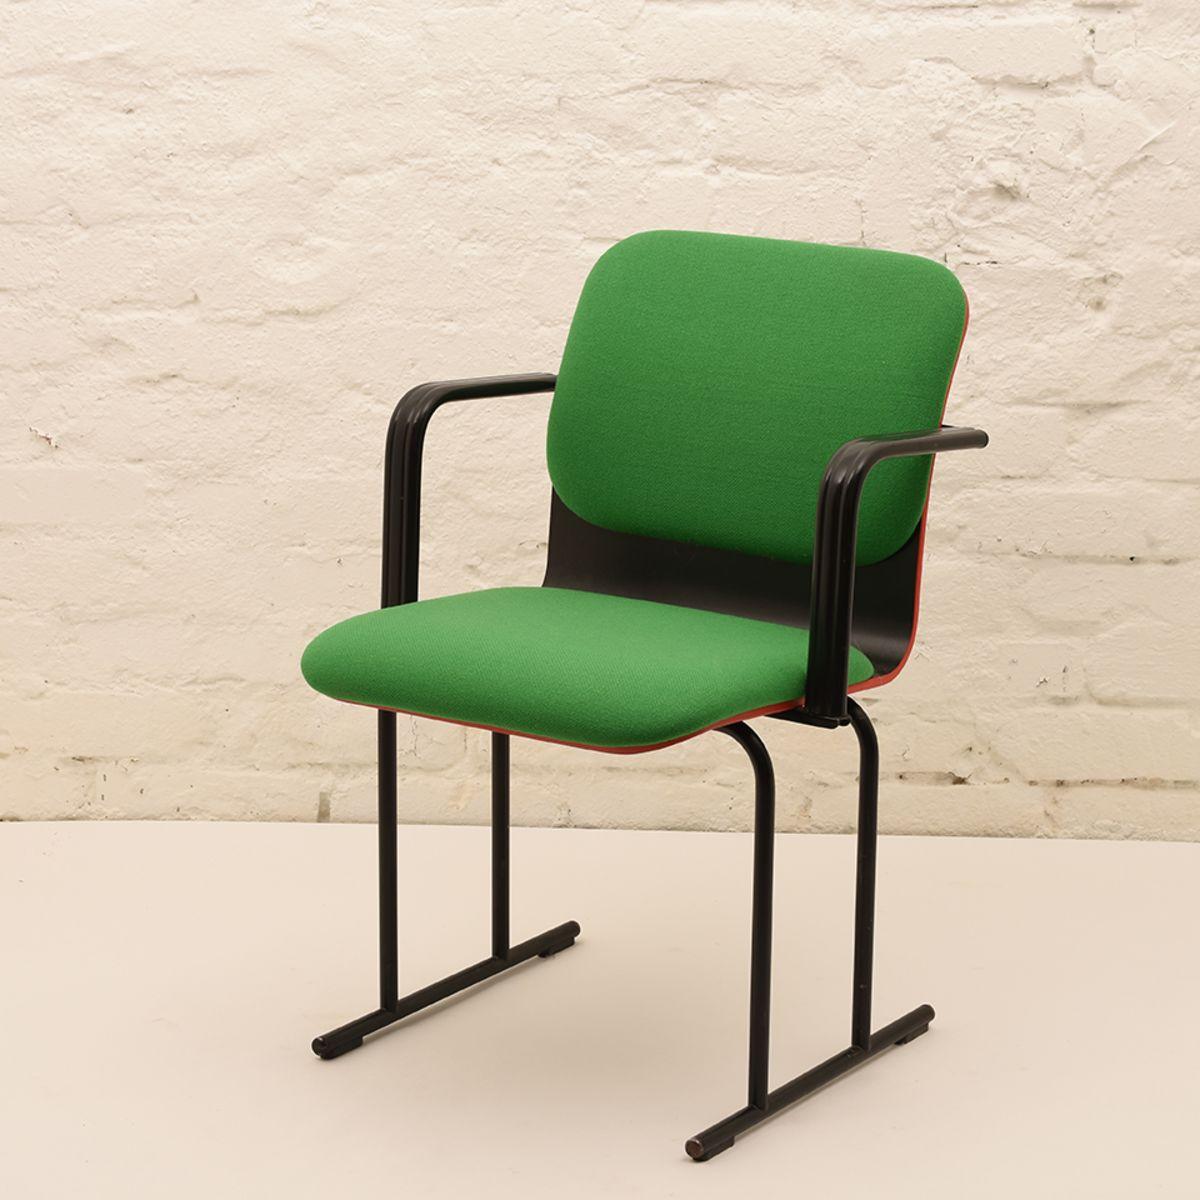 Yrjö-Kukkapuro_Sirkus-Chair